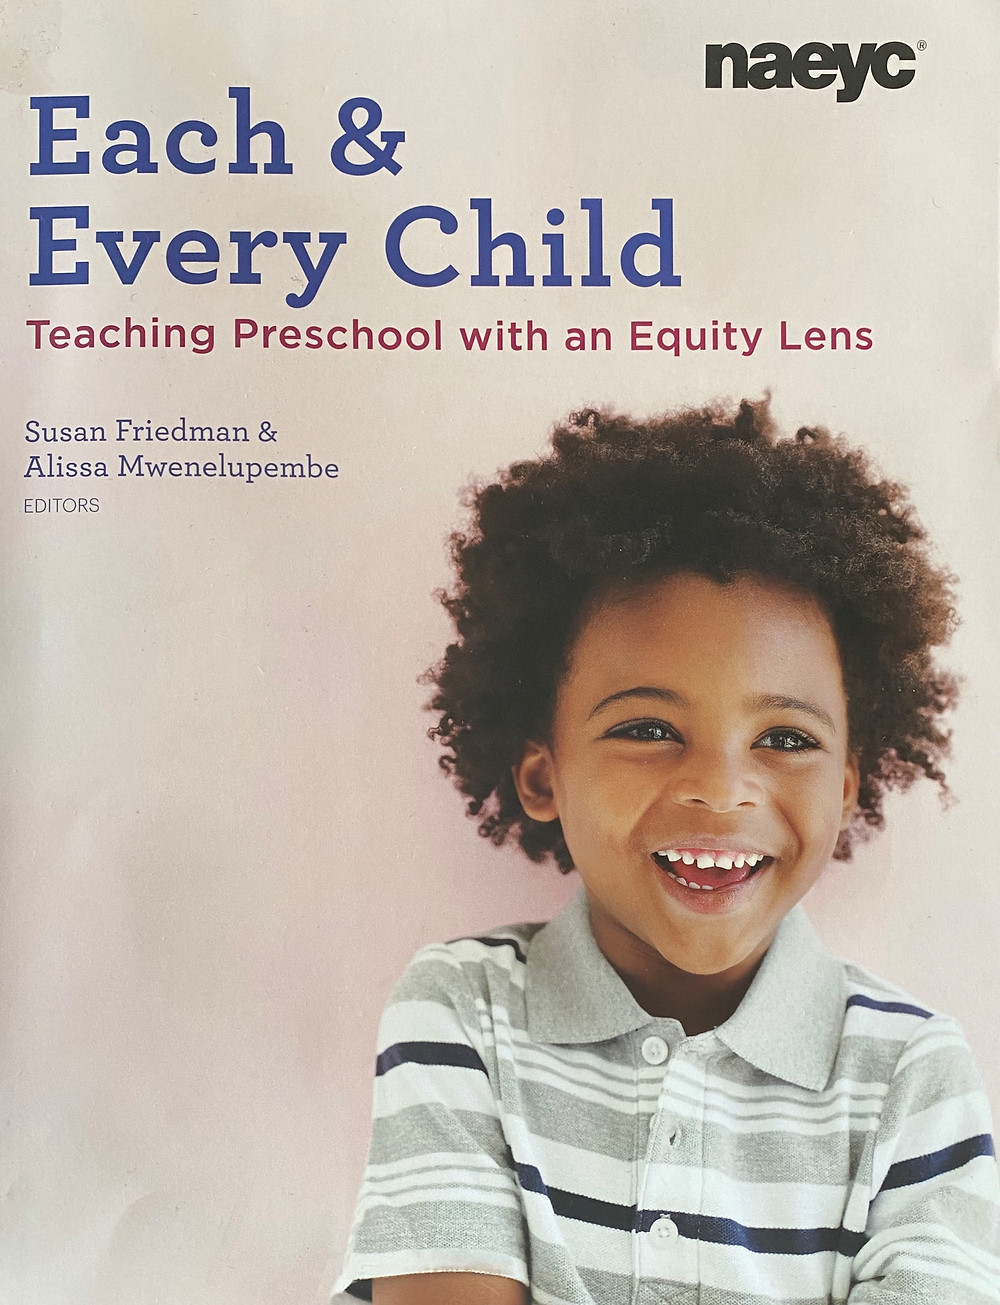 equity in early childhood education, getting rid of bias in preschools